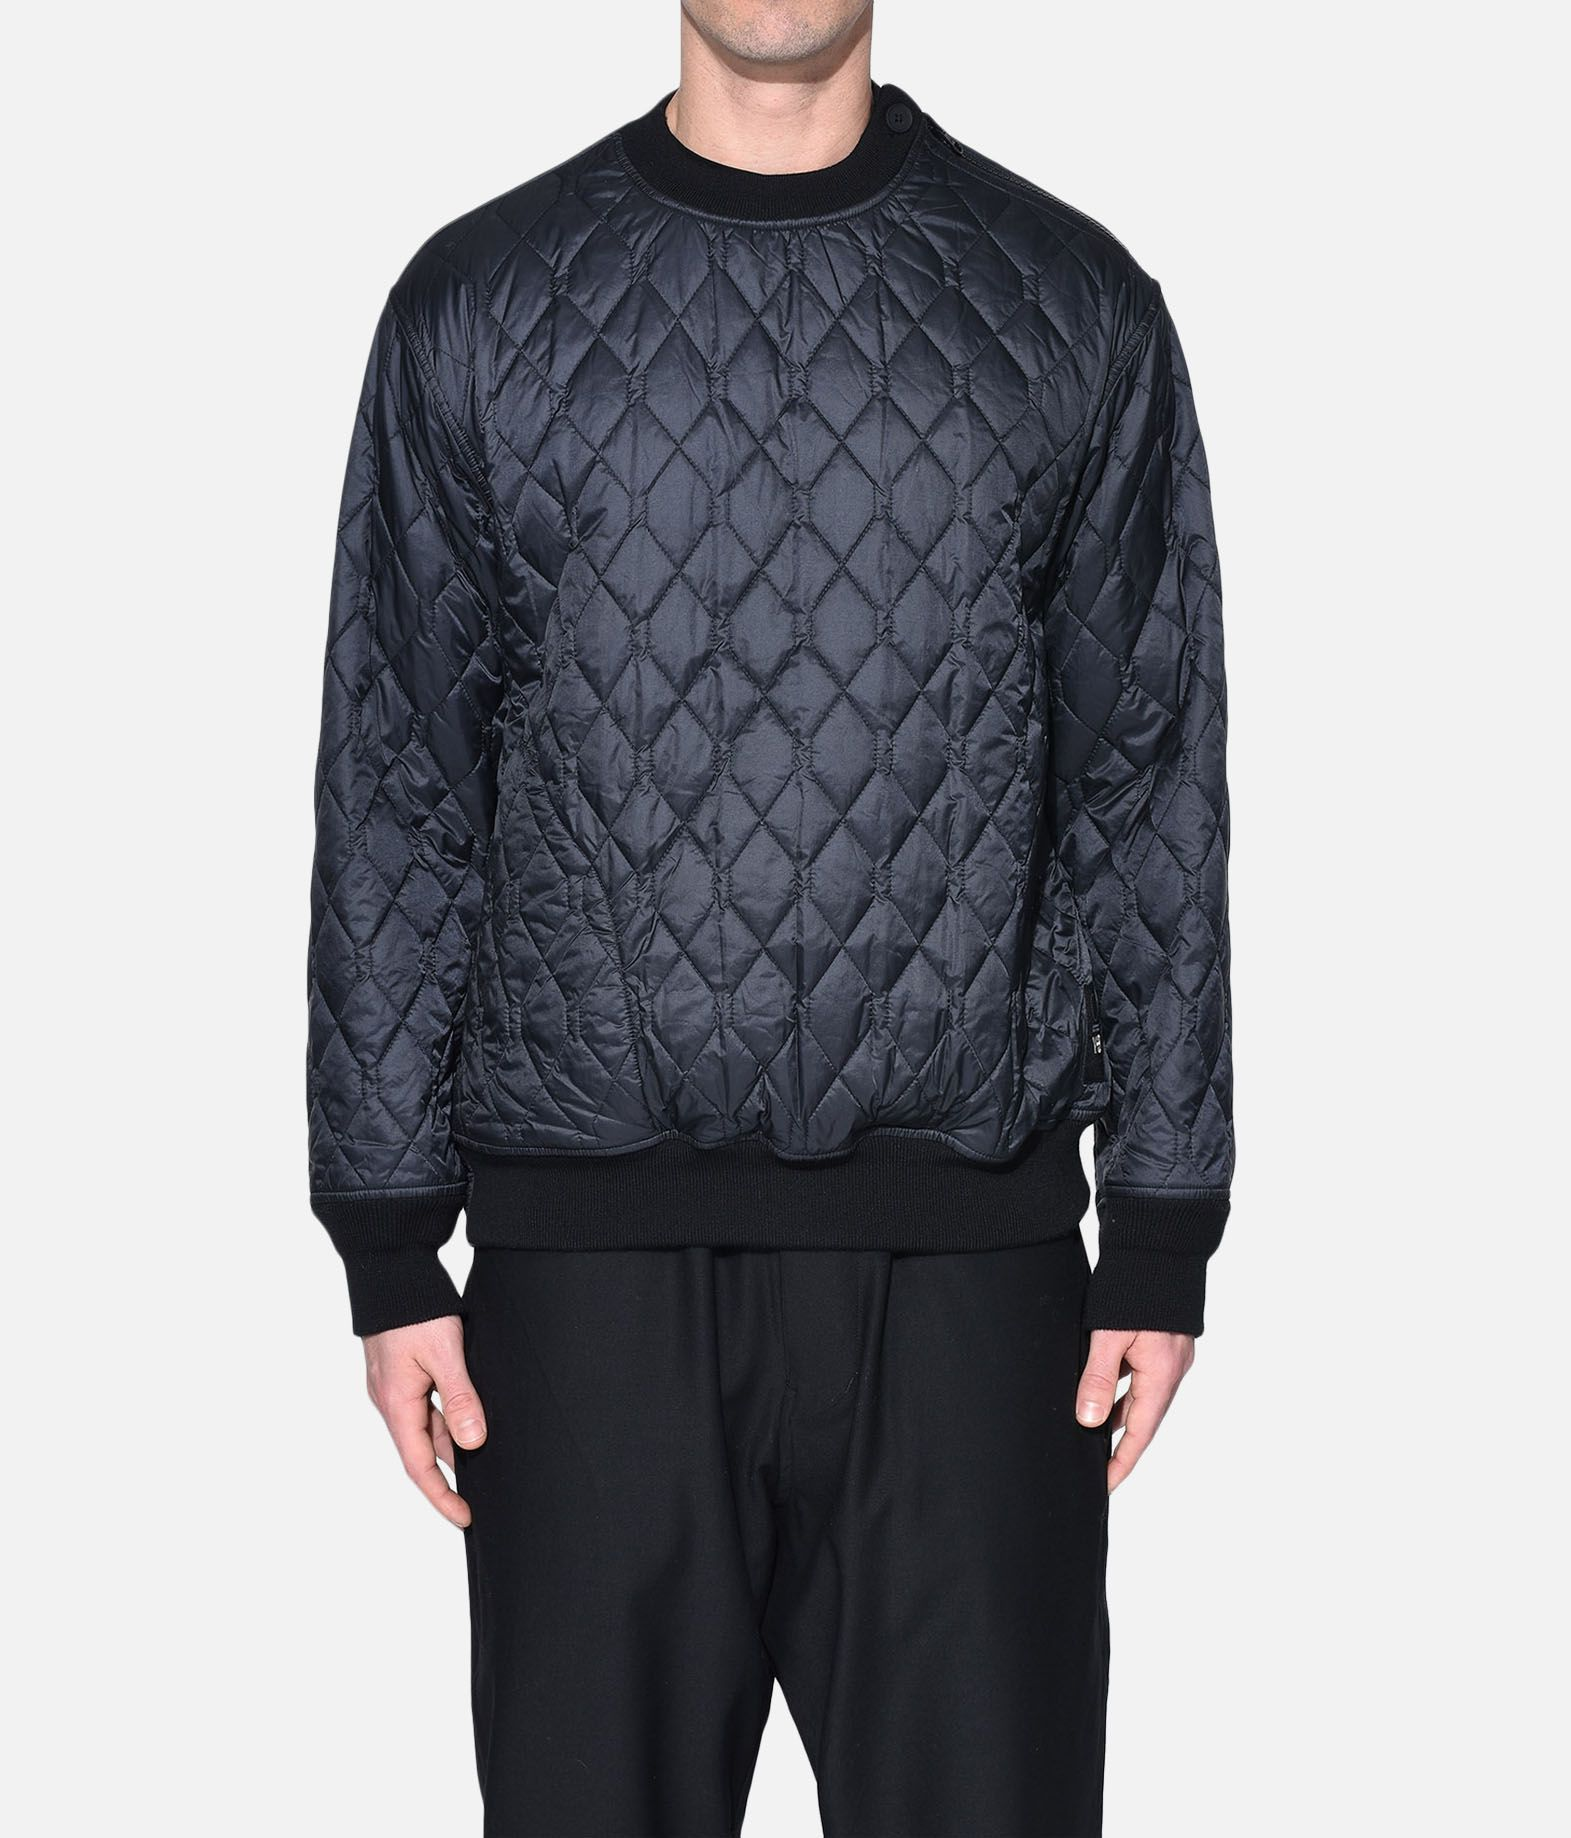 Y-3 Y-3 Quilted Sweater Sweatshirt Man r